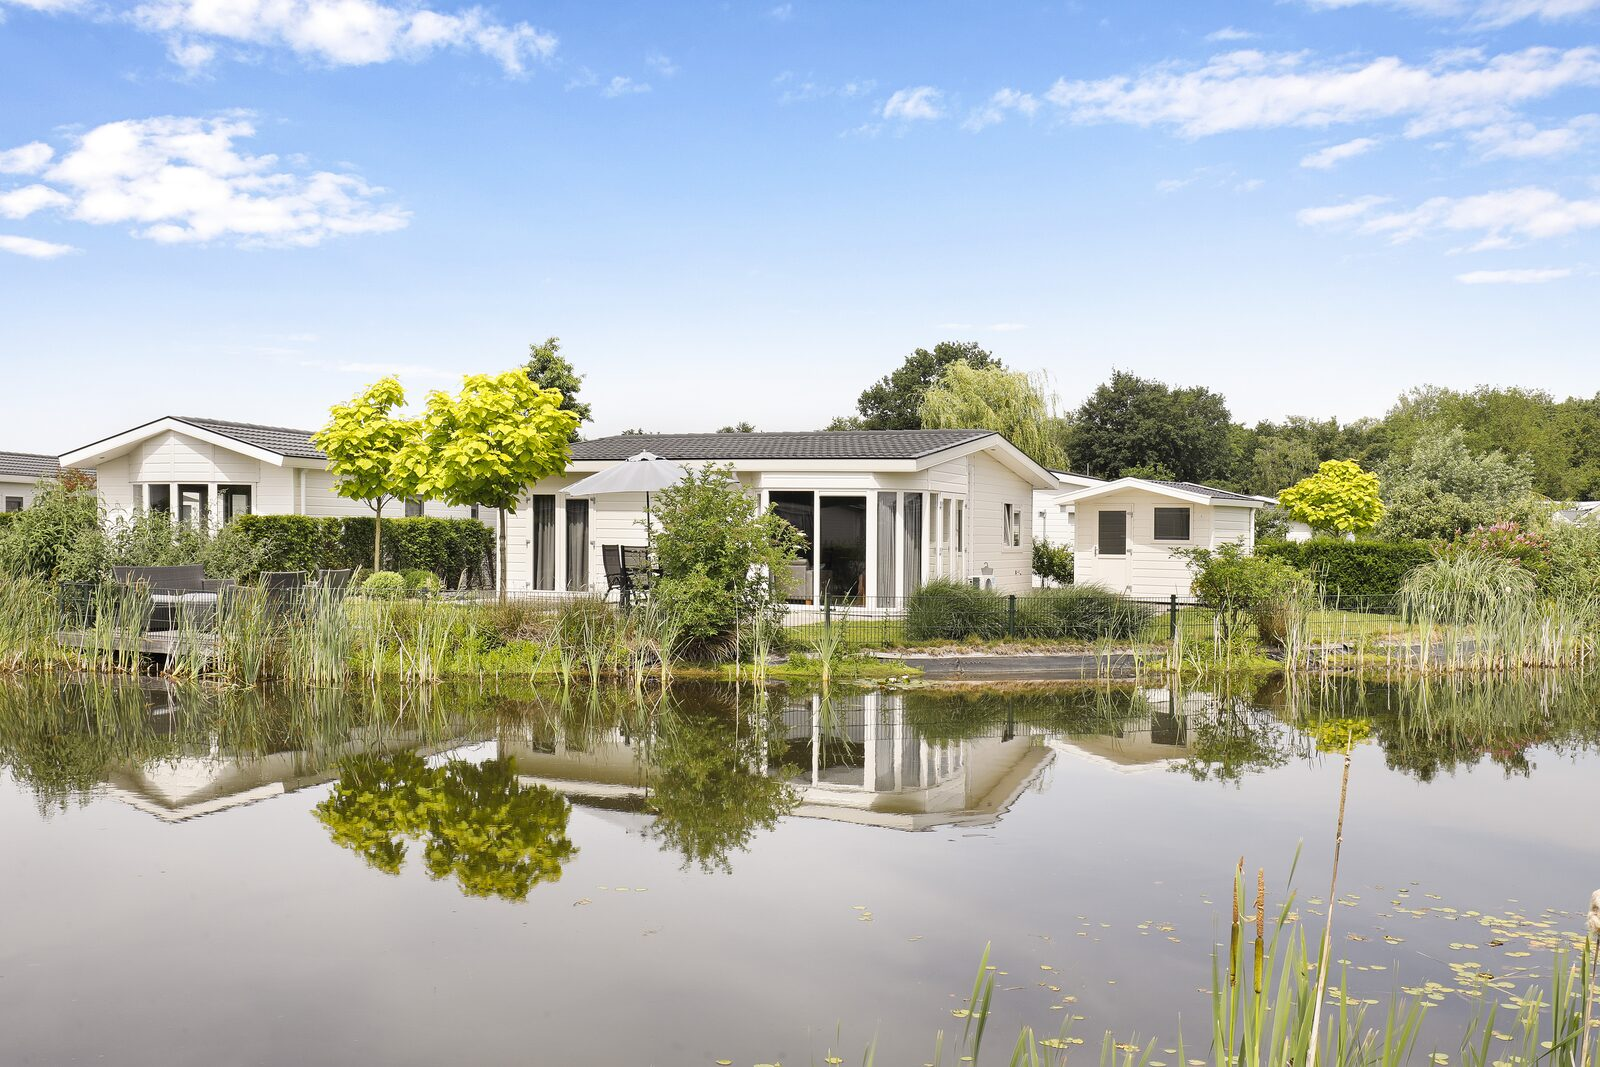 Ferienhaus nahe Harderwijk